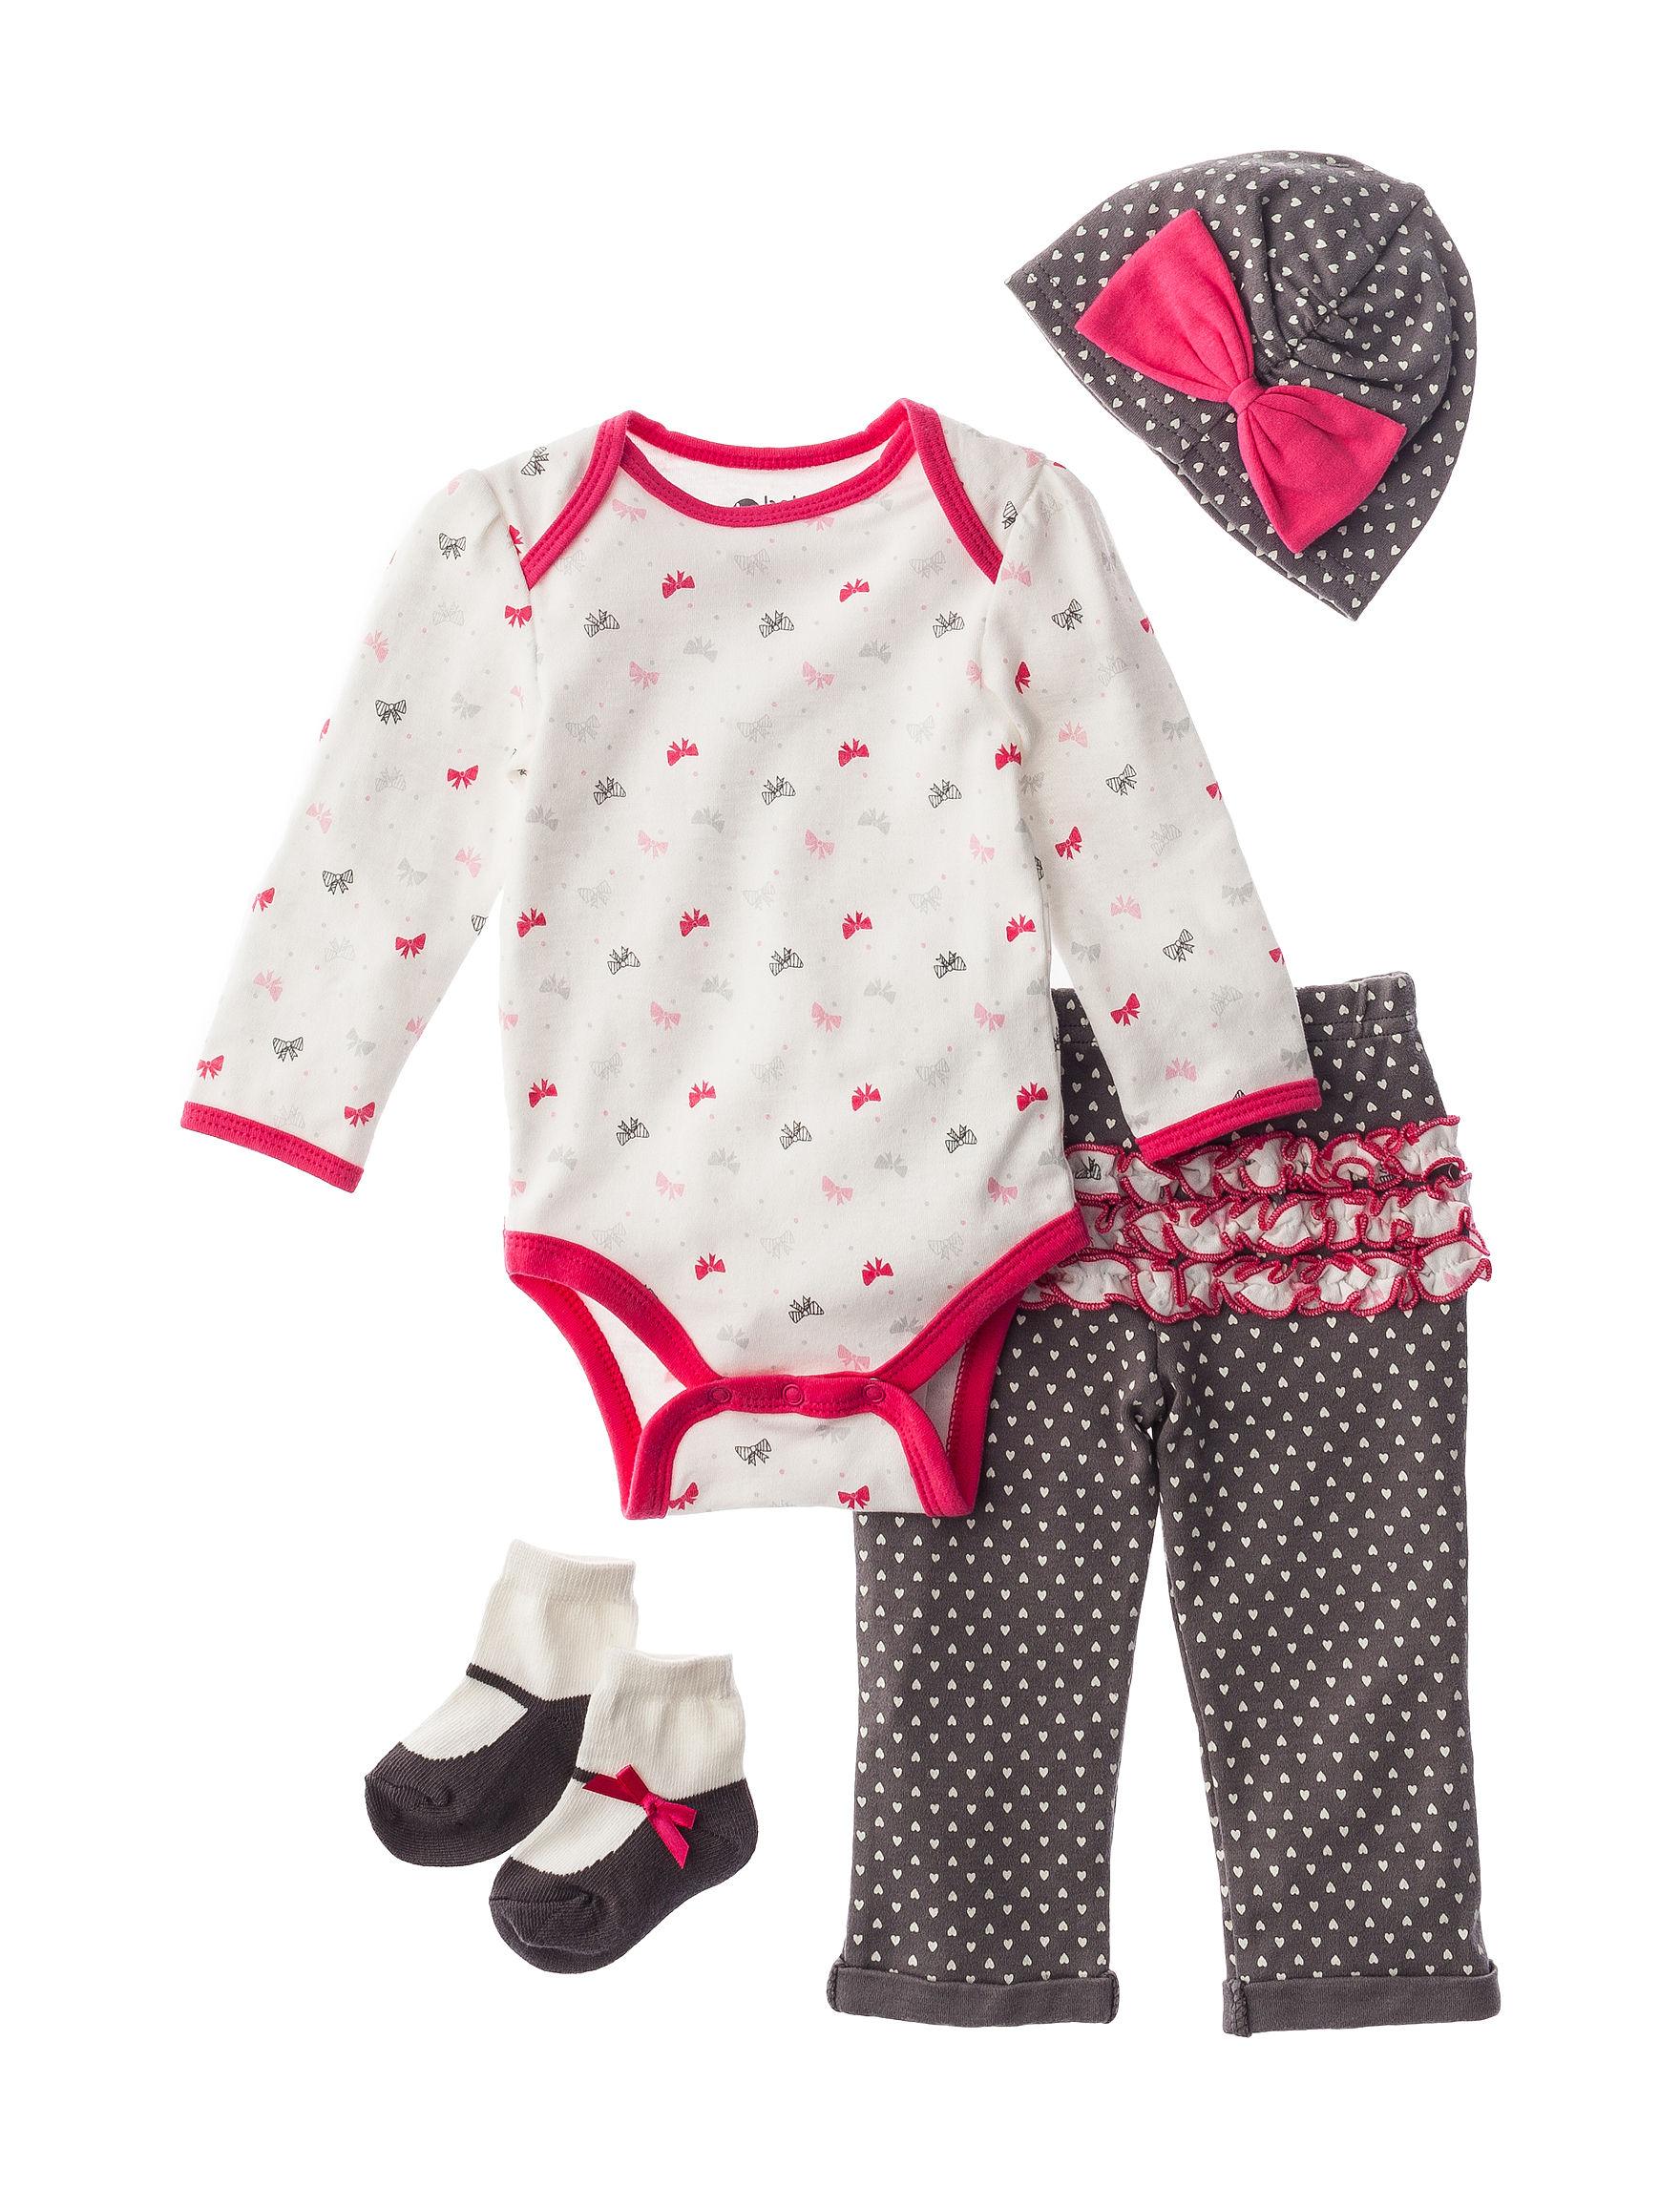 Baby Gear Fuschia